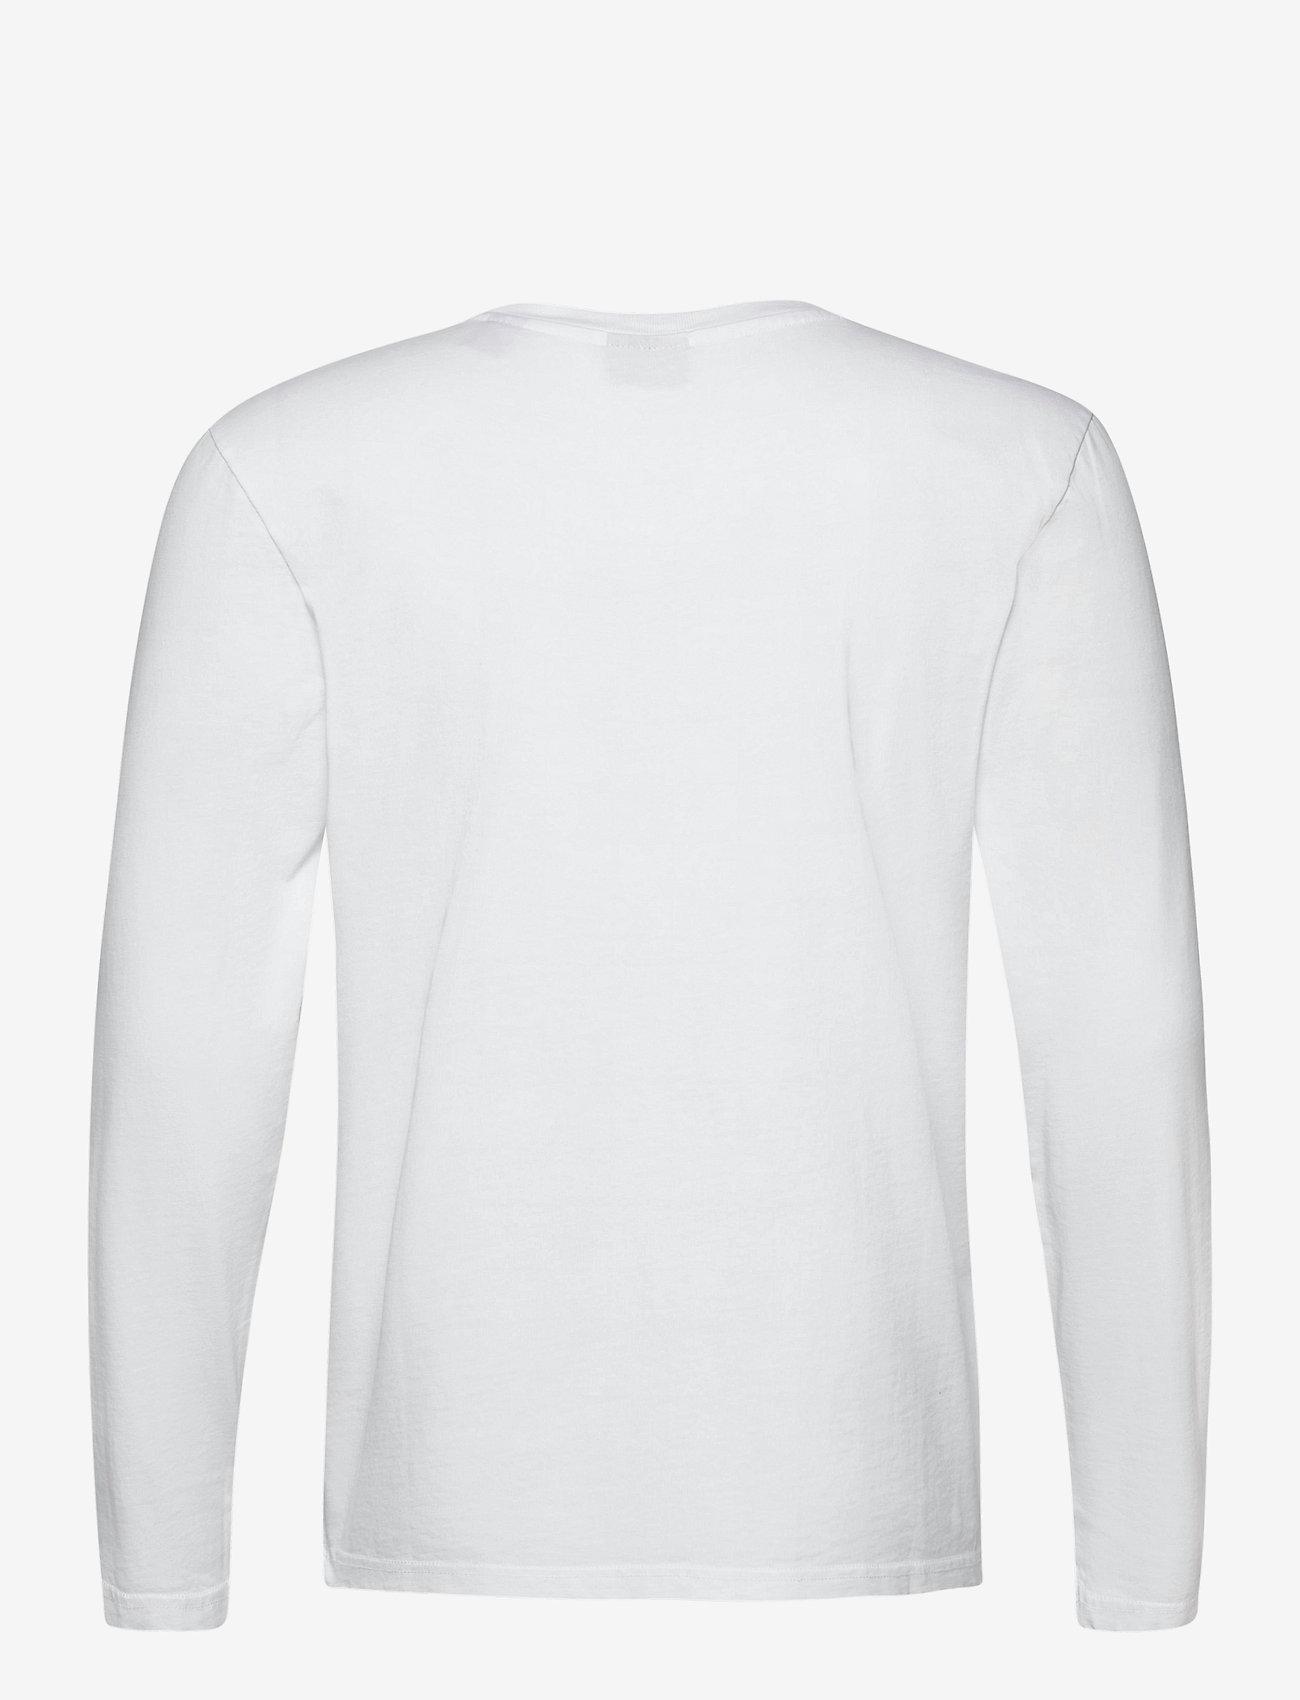 Scotch & Soda - Longsleeve tee in heavy organic cotton - basic t-shirts - denim white - 1